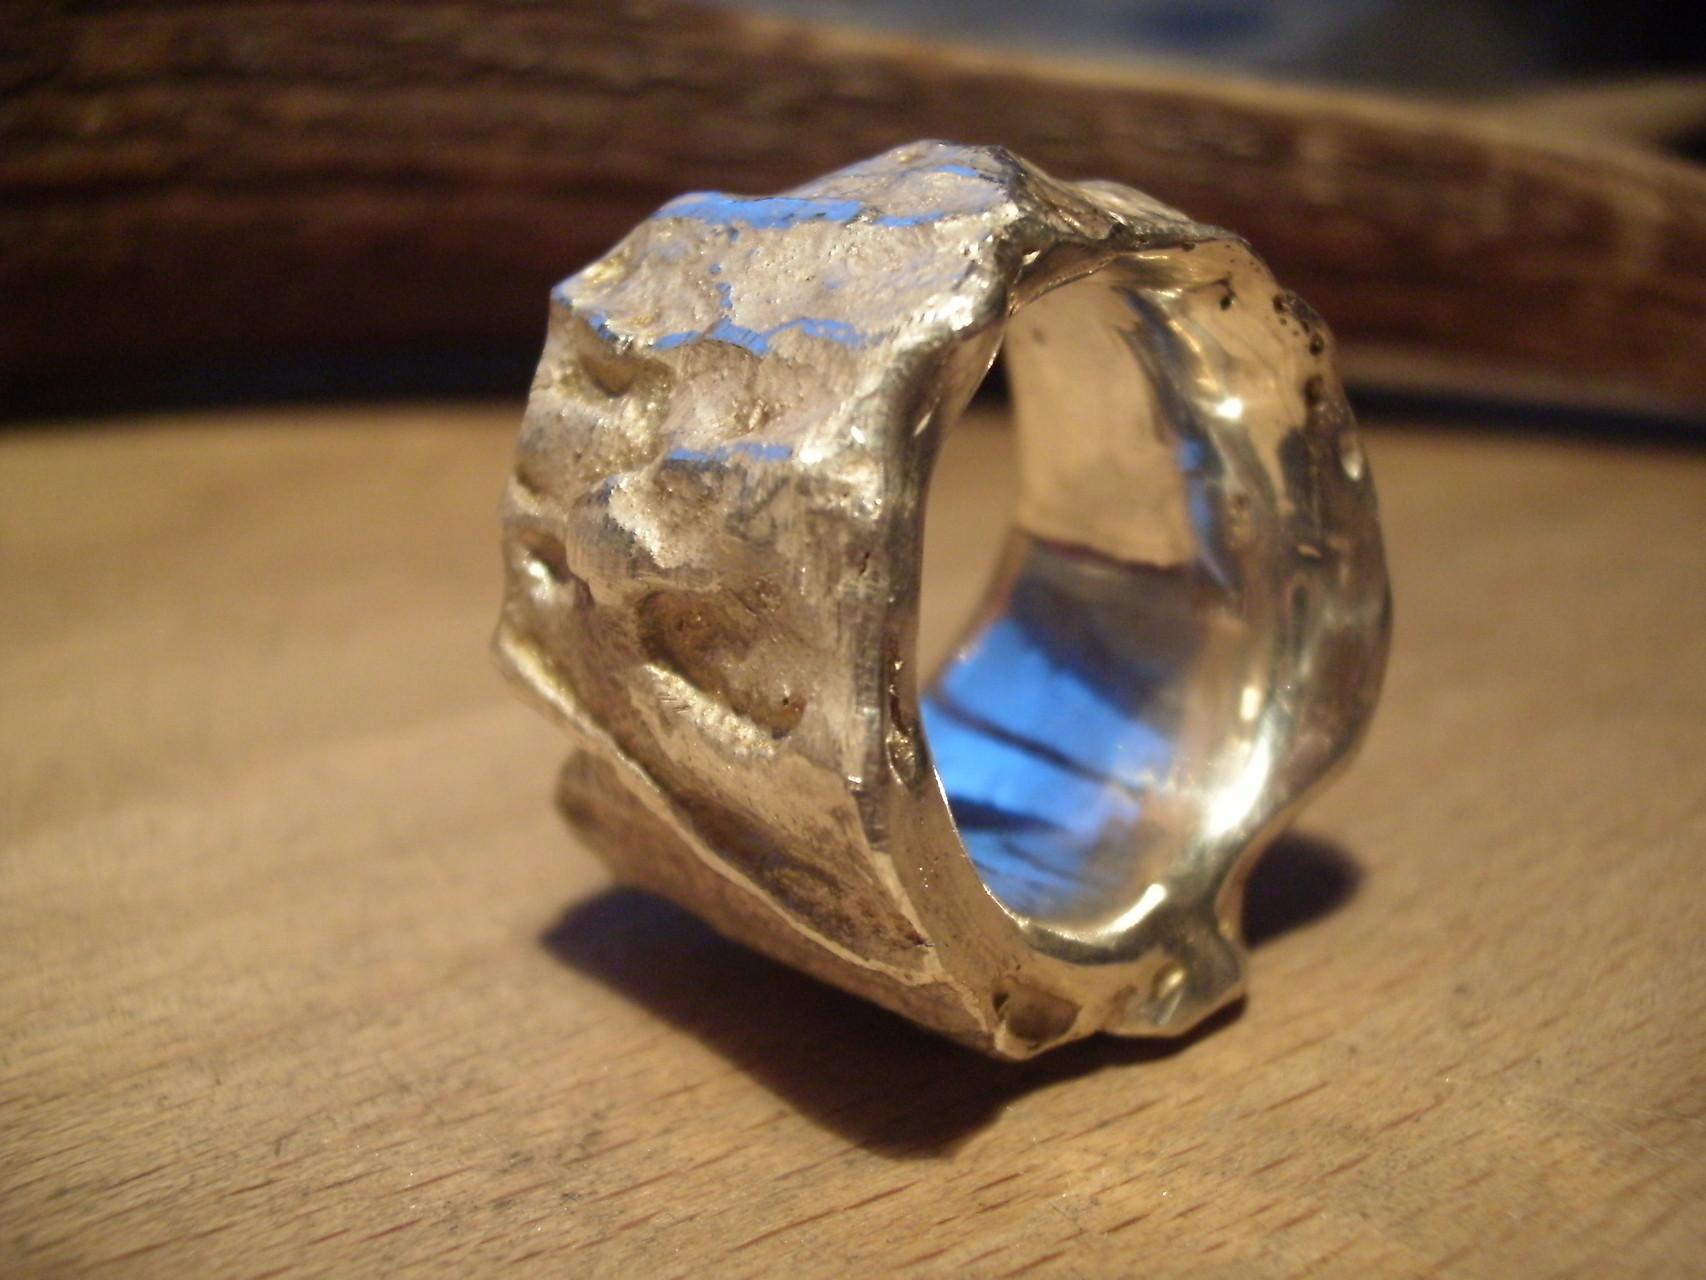 Massiver Silberring aus verschweissten Silberstücken (925 Sterlingsilber) Preis: CHF 320.-